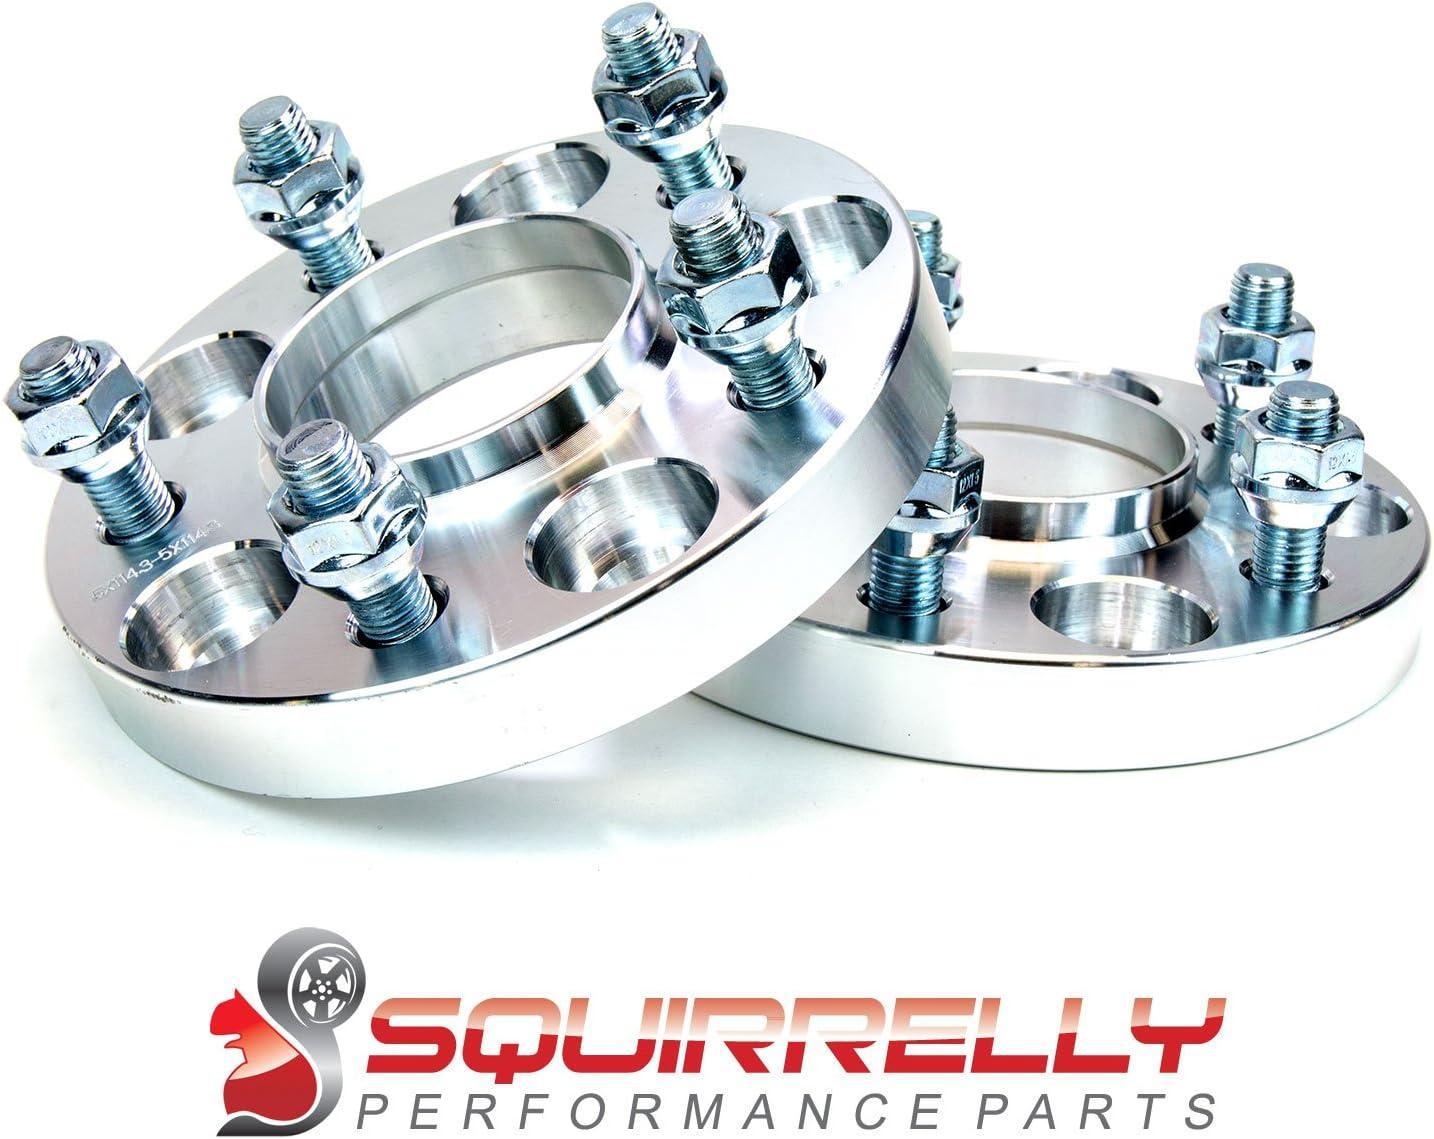 Squirrelly Aluminum Hub-Centric Wheel Spacers